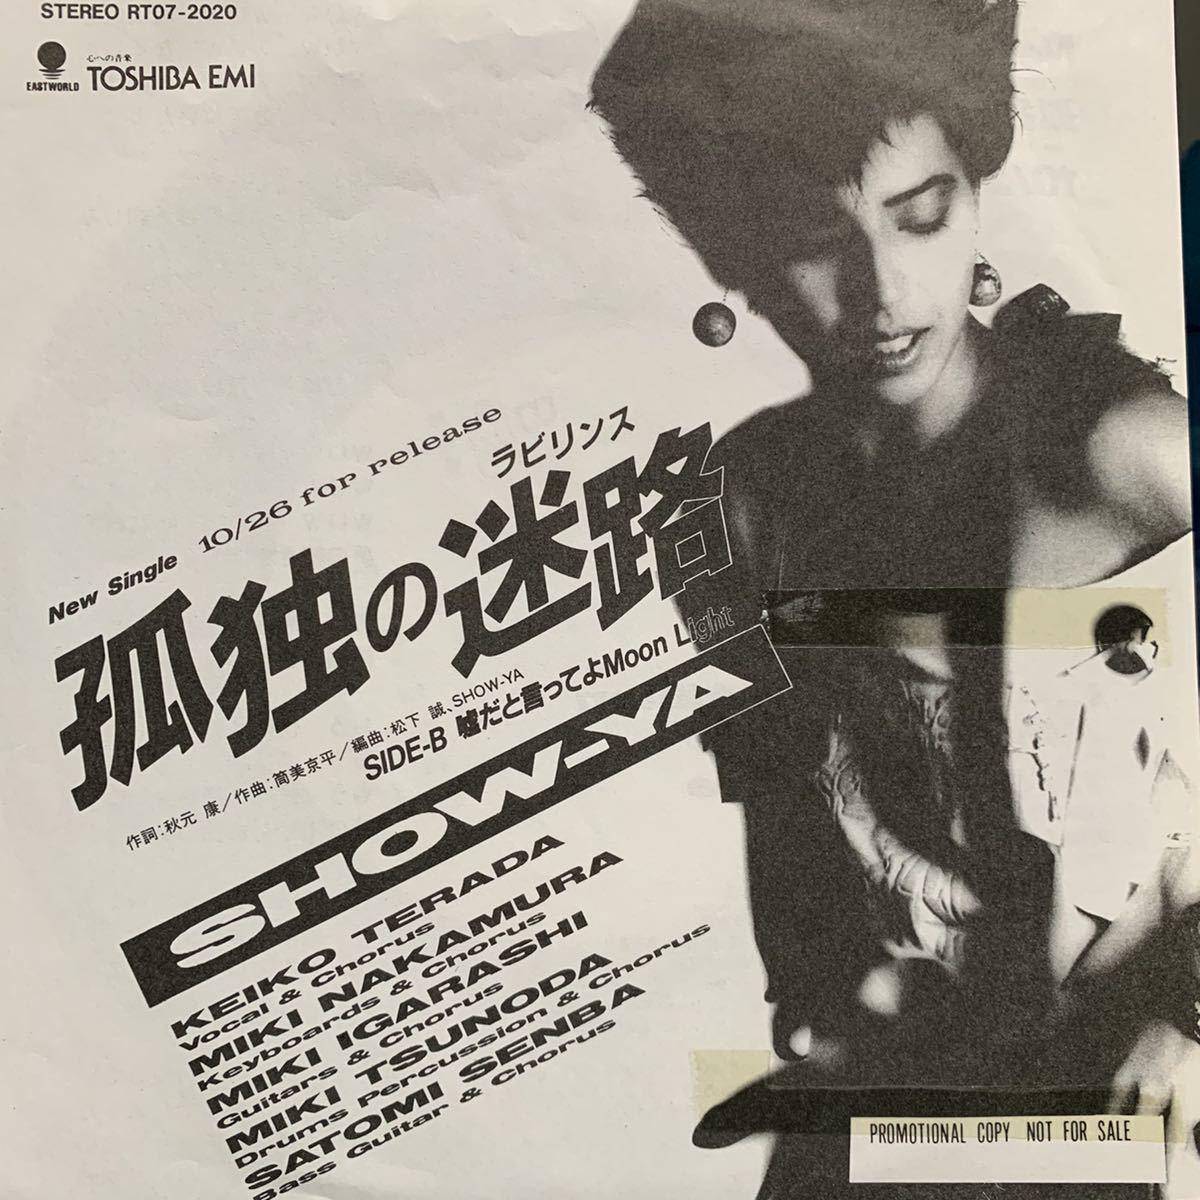 【EP】【7インチレコード】激レア 非売品 見本盤 プロモオンリー SHOW-YA / 孤独の迷路 CD移行期_画像1